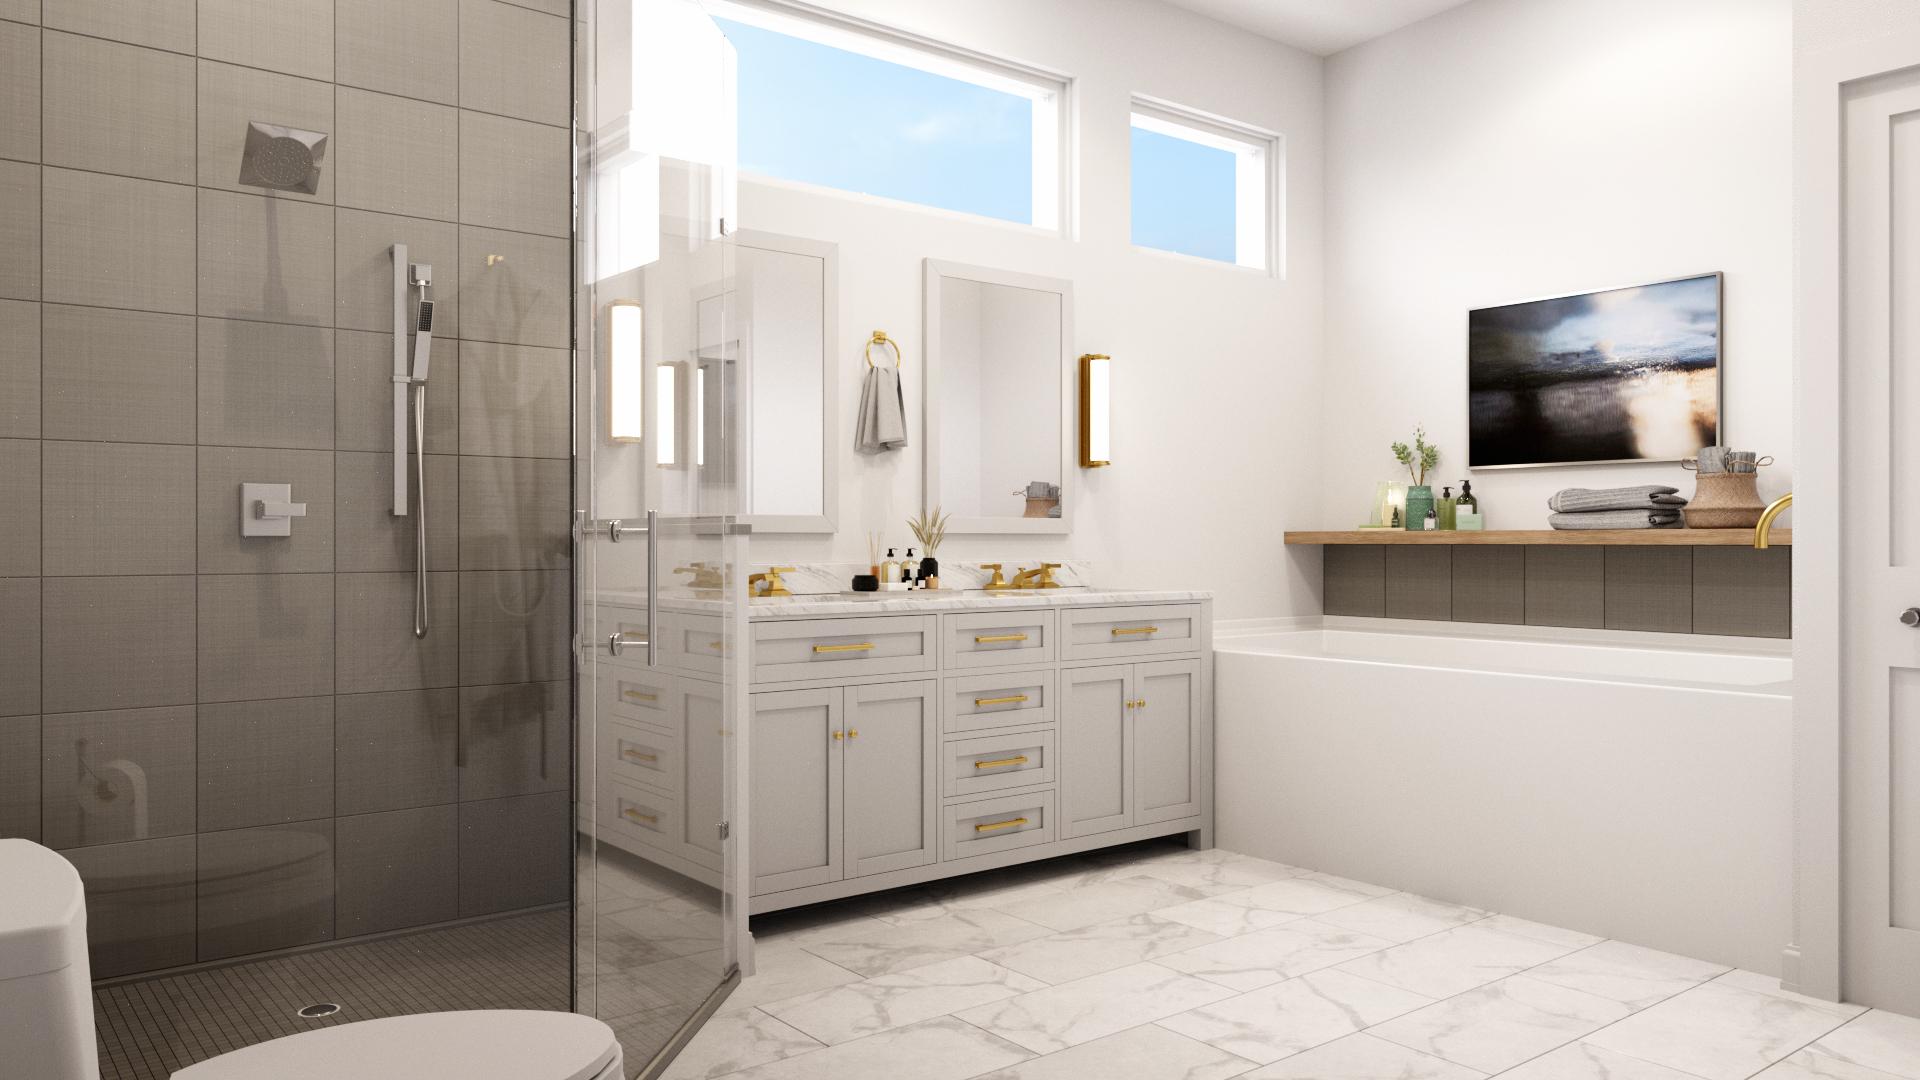 19014201-H2 Townhomes_Interior_Web_Bathroom